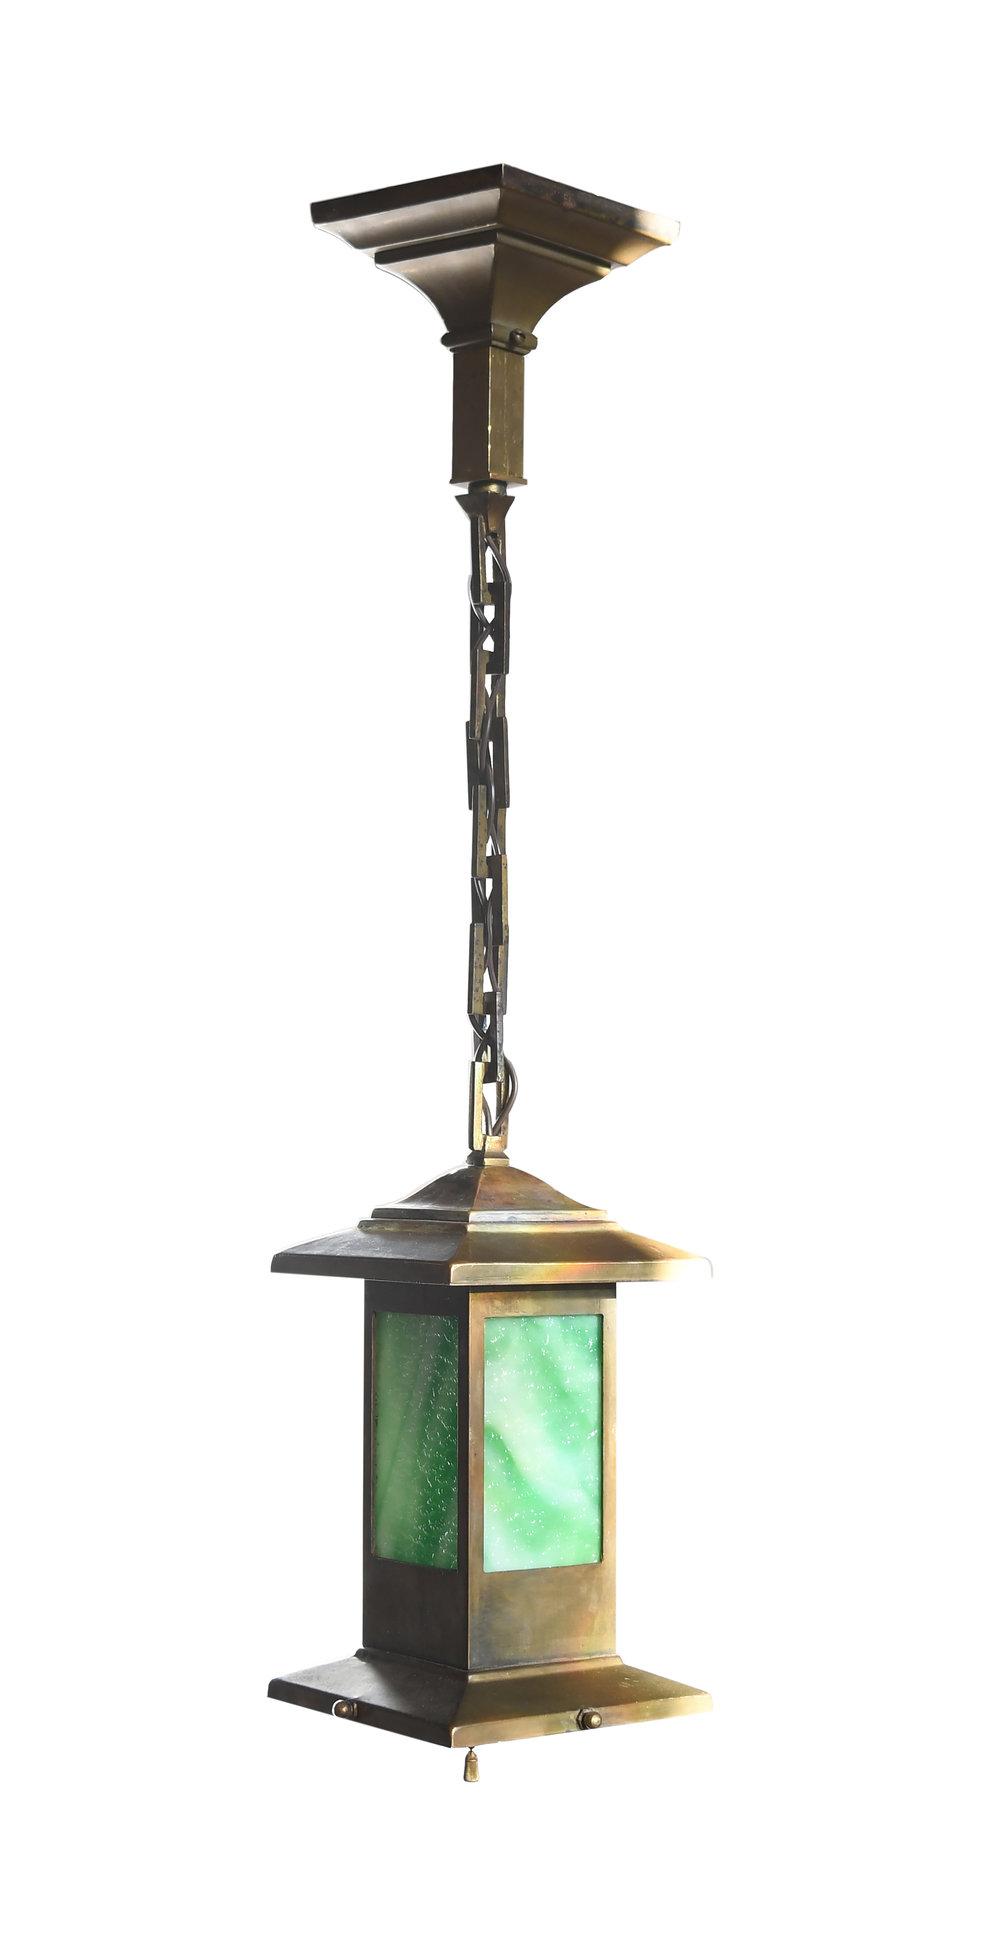 47596-rectangular-brass-handel-pendant-with-green-glass-overall-1.jpg